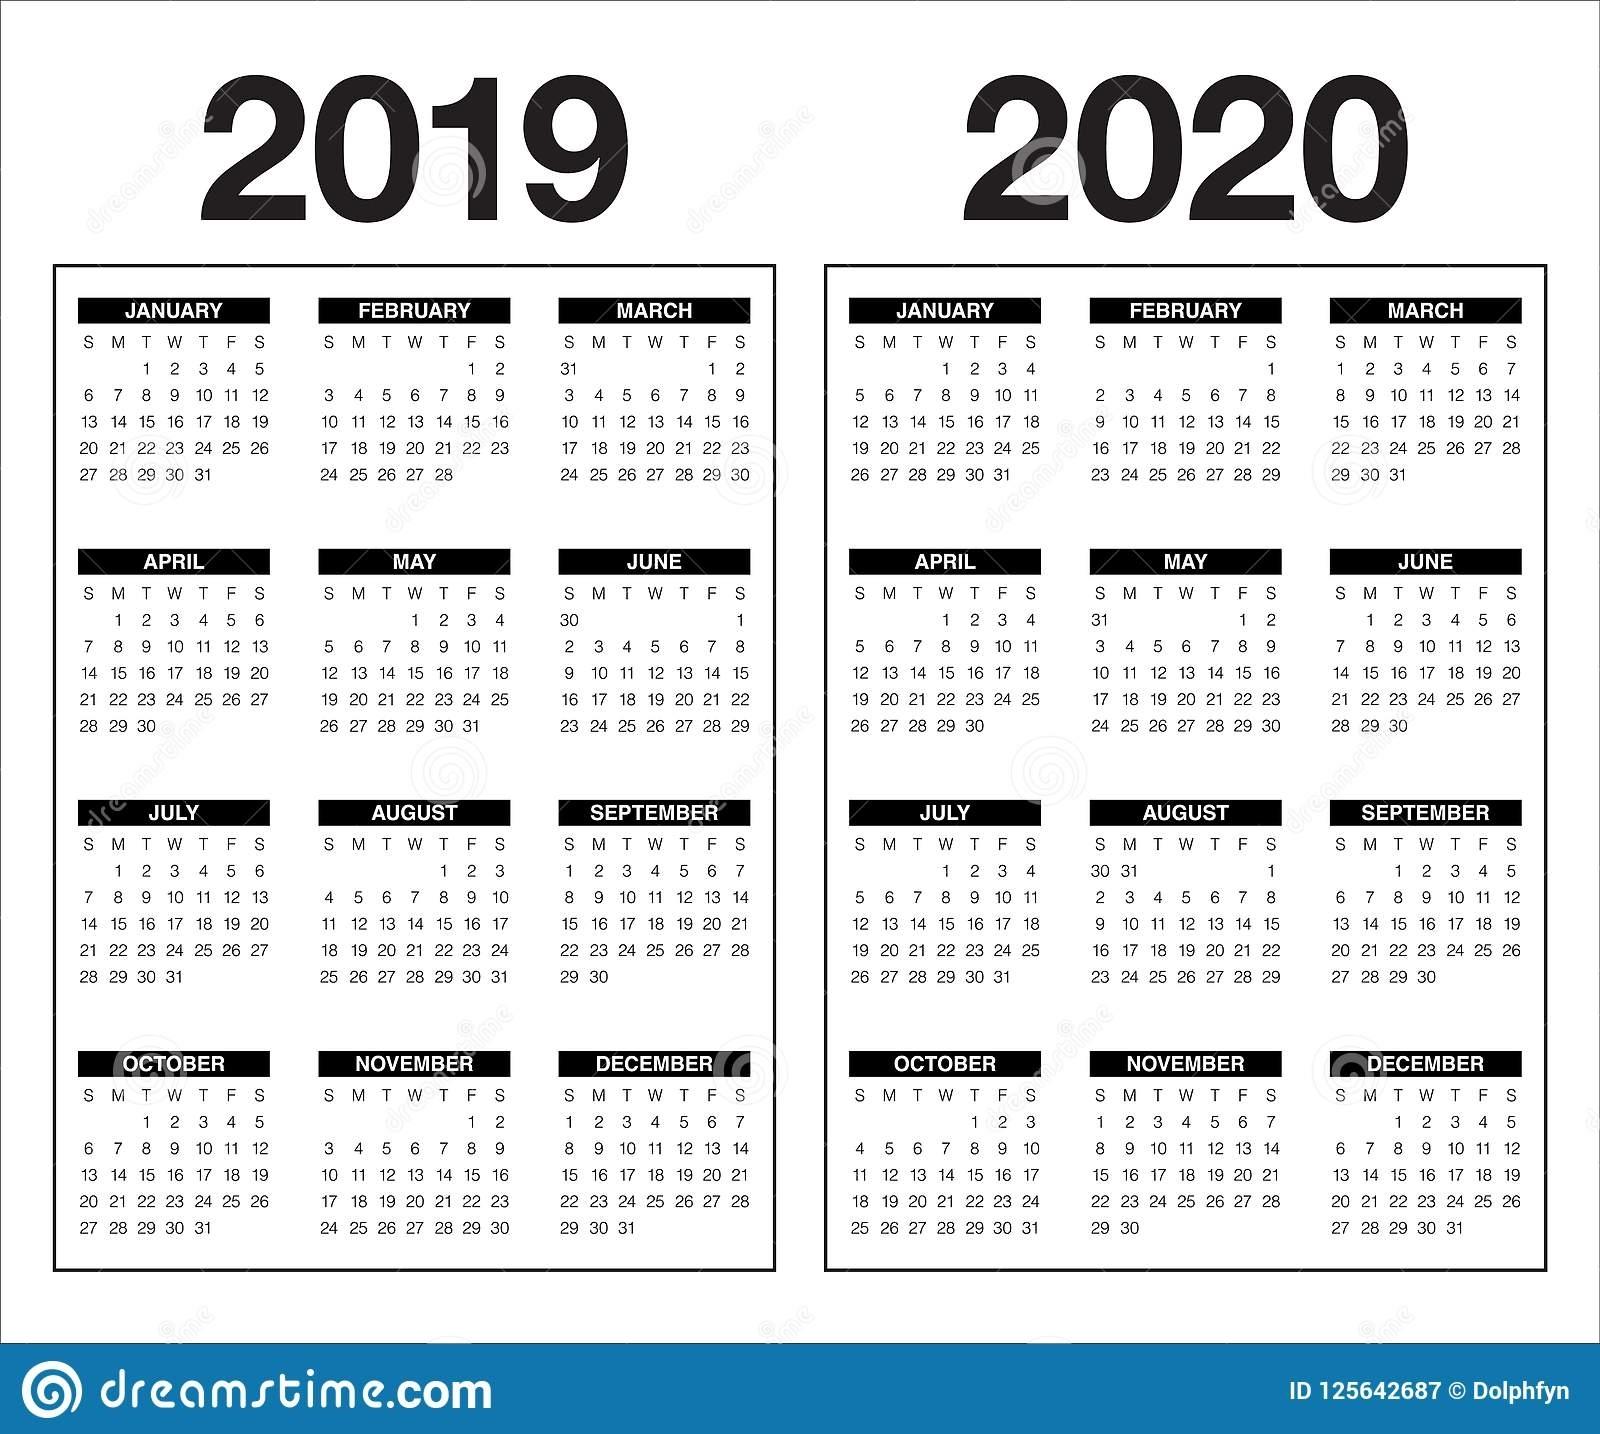 Year 2019 2020 Calendar Vector Design Template Stock Vector regarding U Of C Calendar 2019/2020